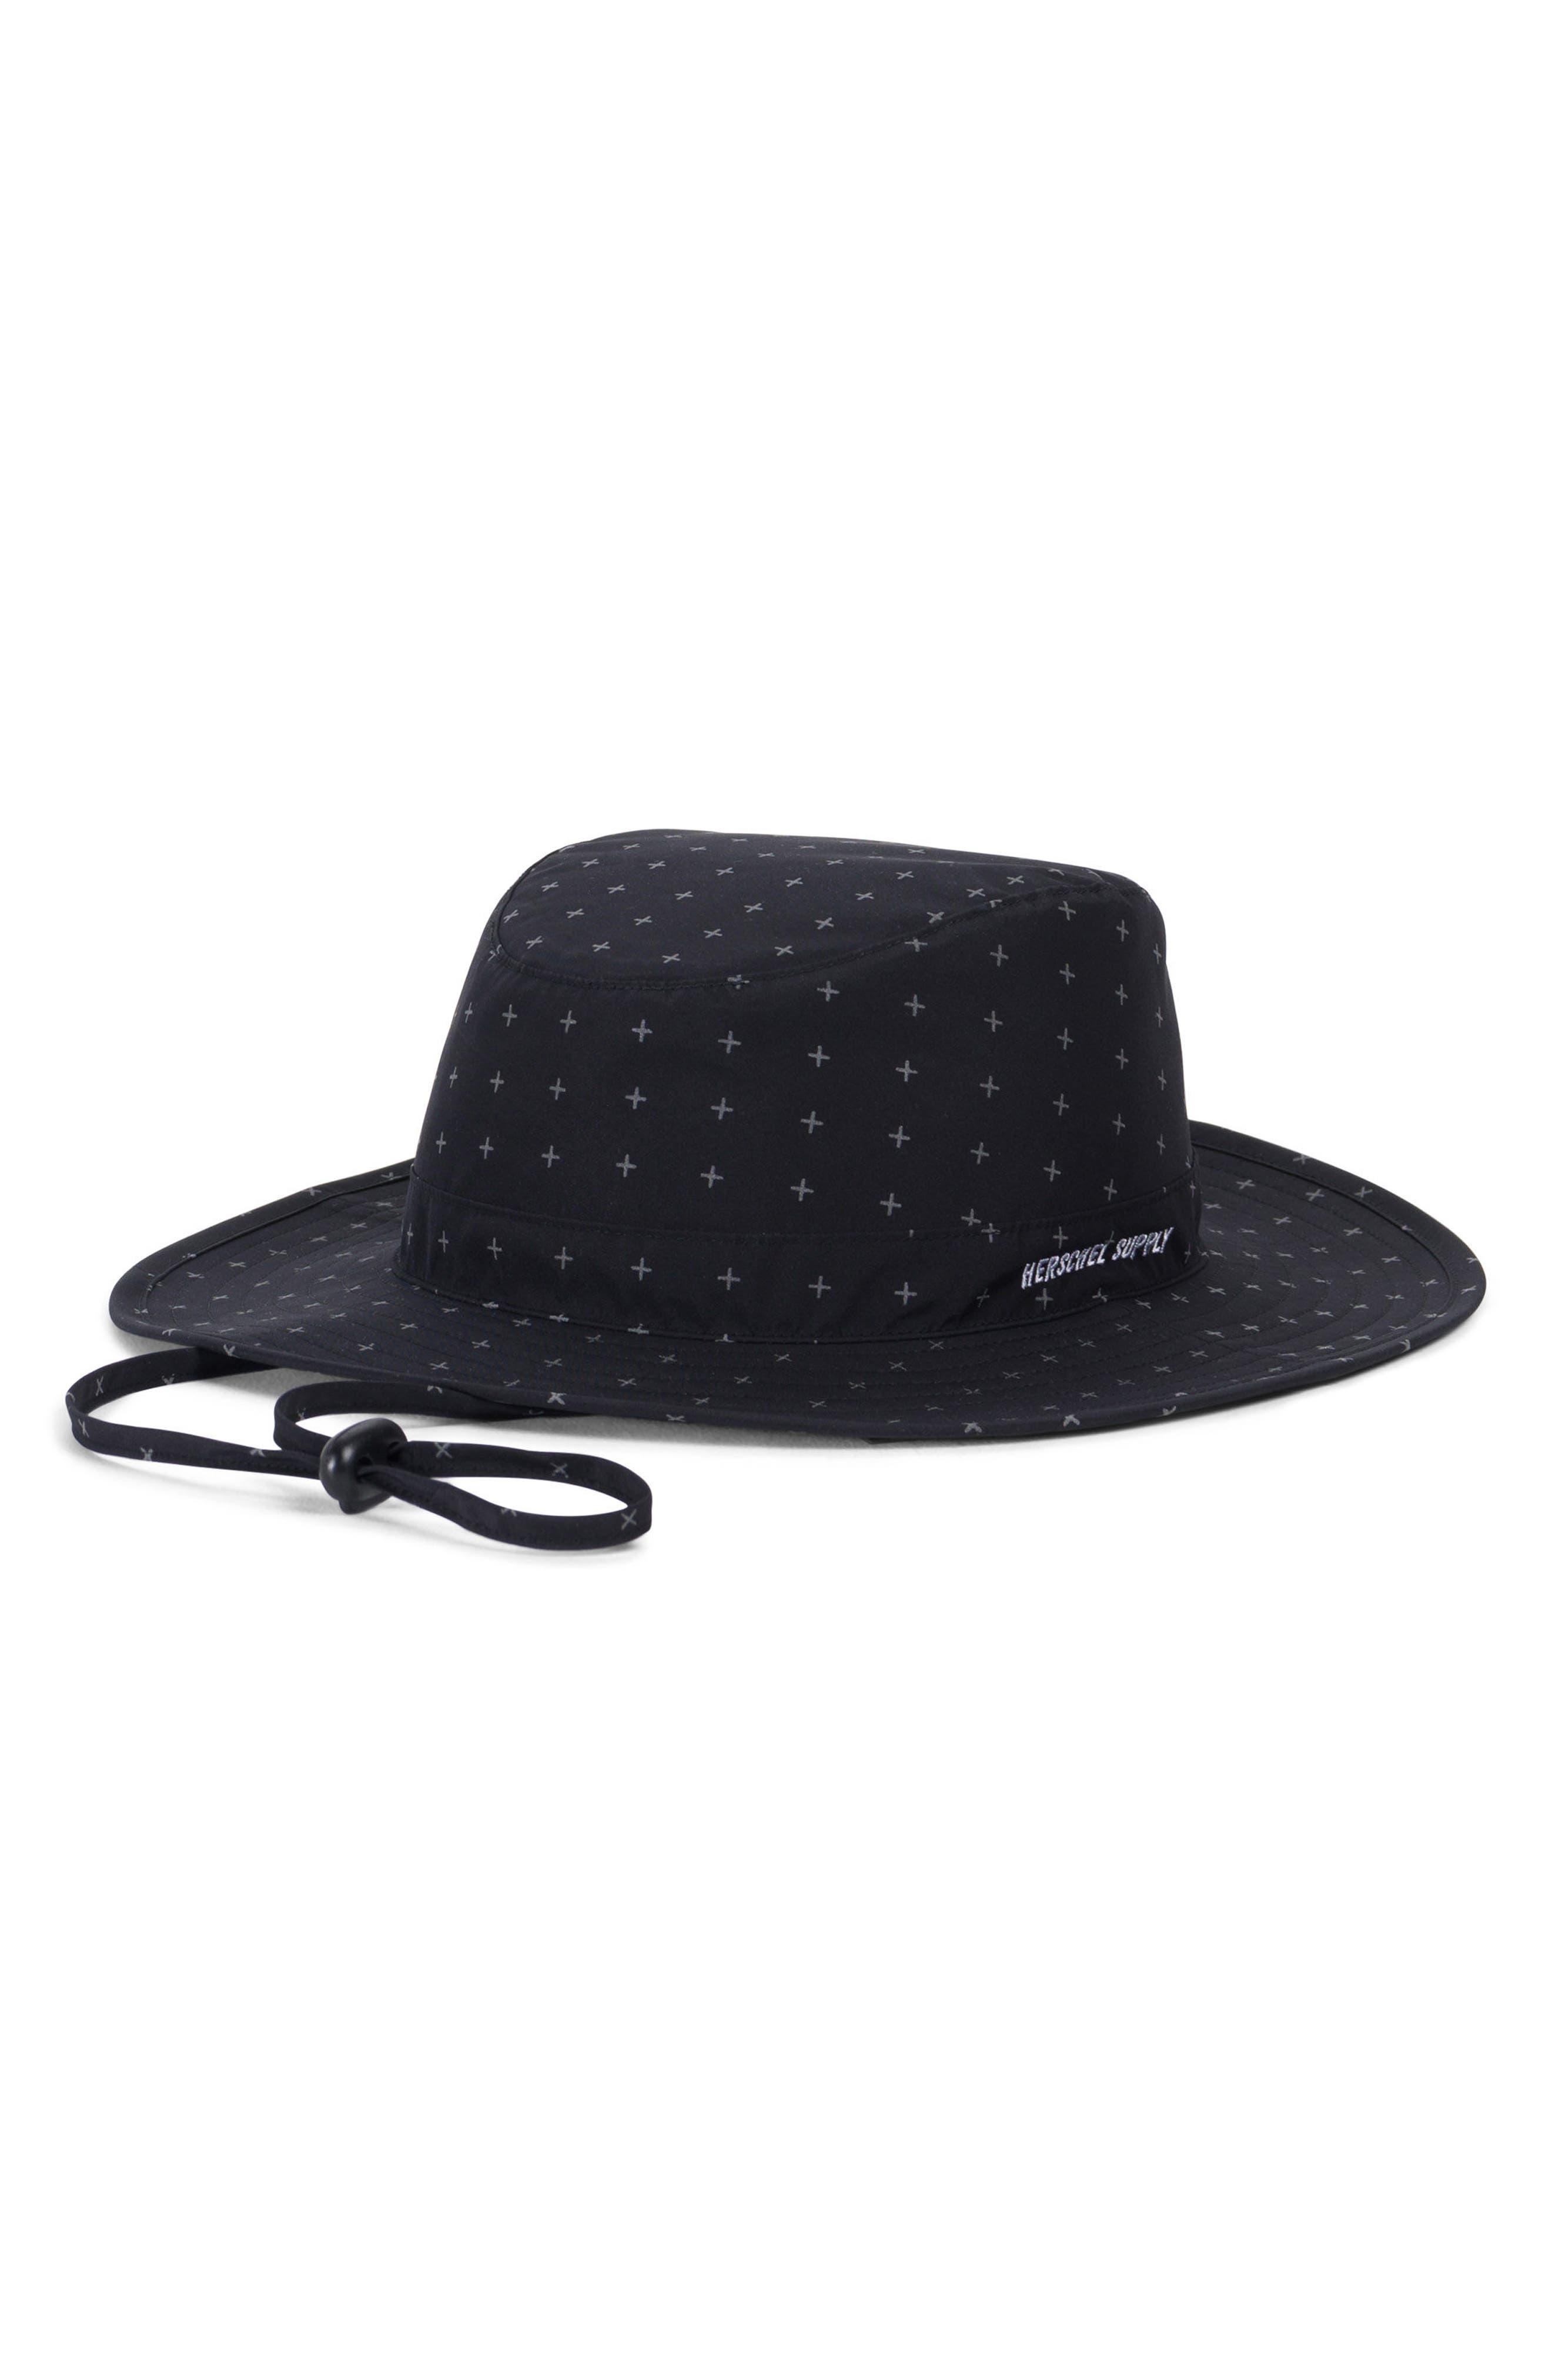 Creek Gore-Tex<sup>®</sup> Bucket Hat,                         Main,                         color, Black Gridlock